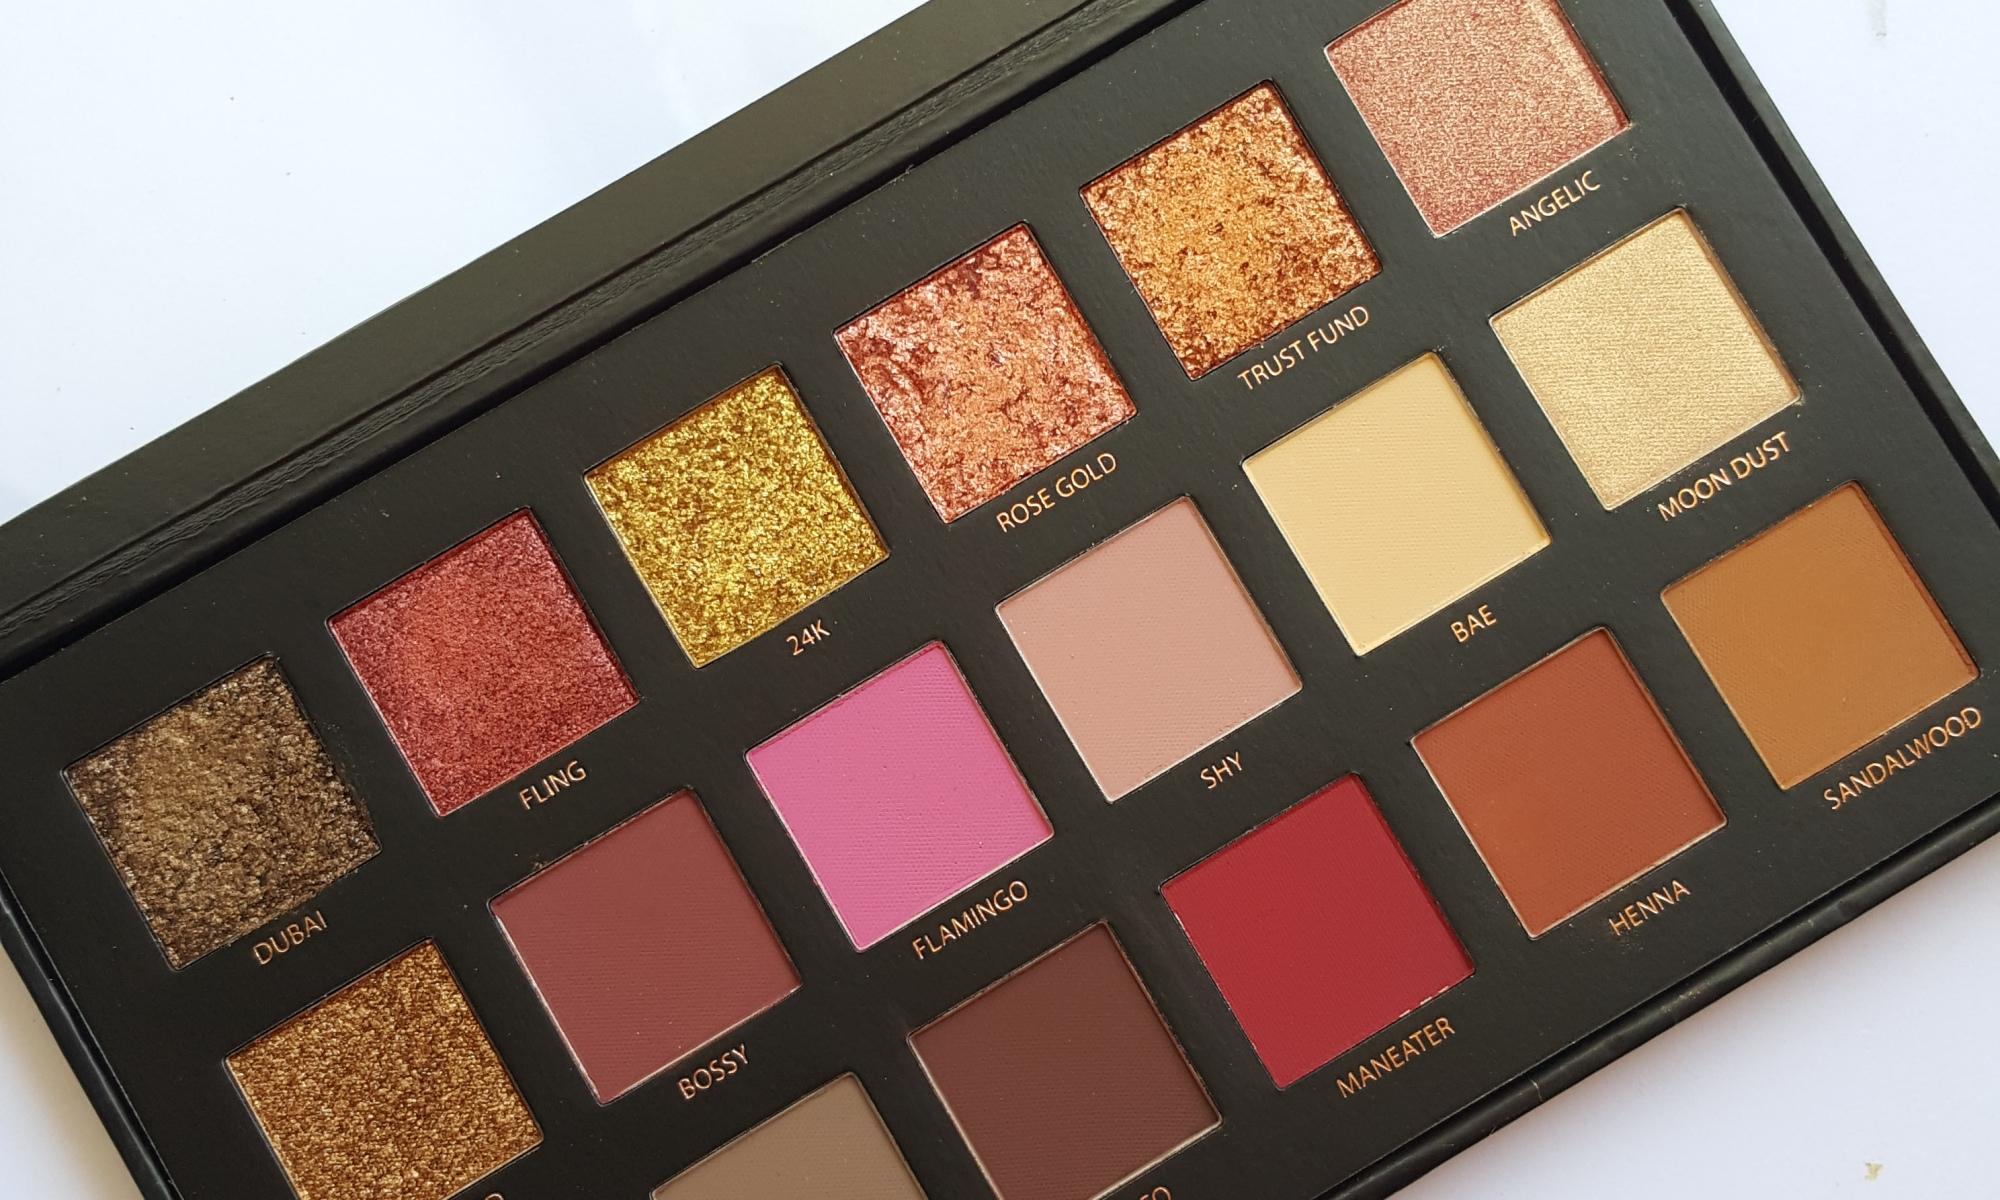 huda beauty textured shadows rose gold eyeshadow palette, eye shadow palette, review, swatches, metallic shadows, matte shadows